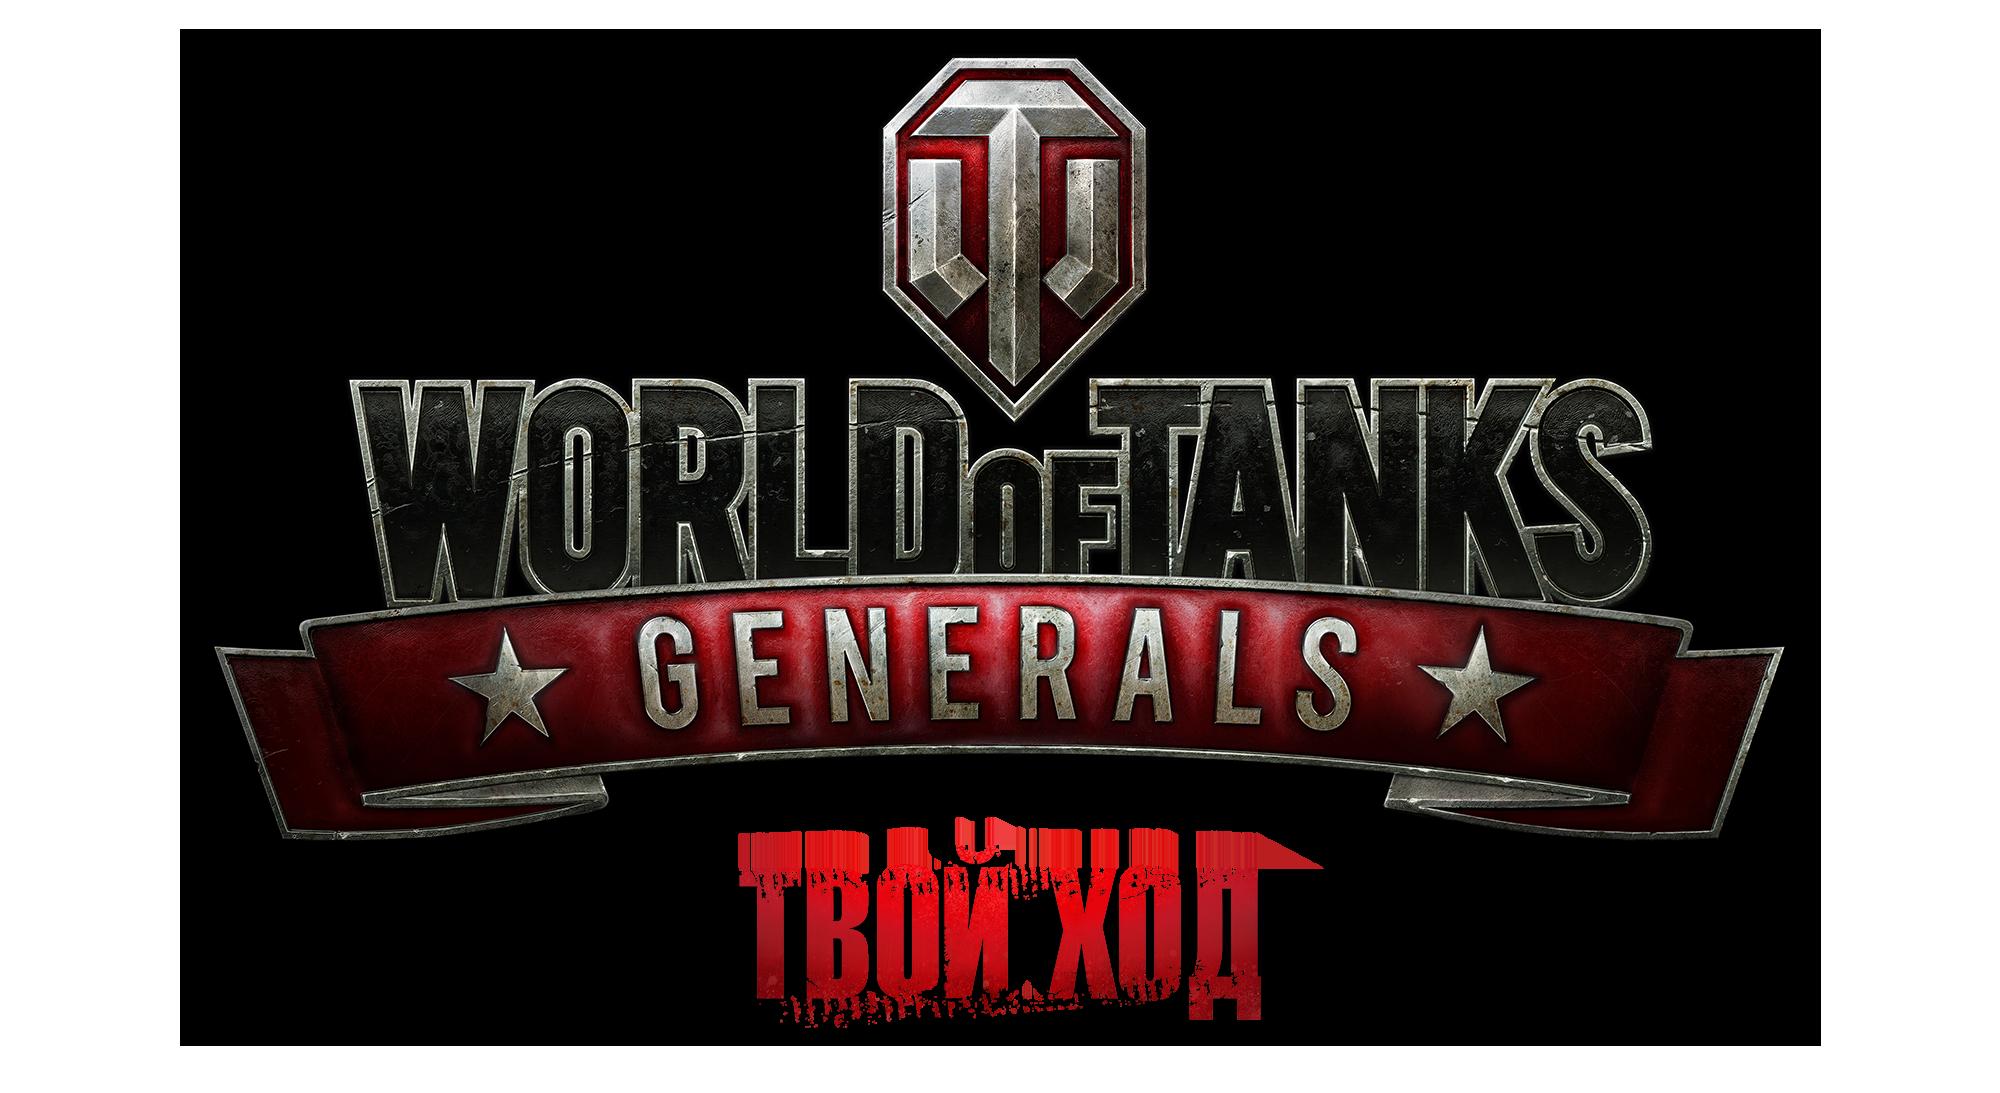 Раздача ключей в бета-версию World of Tanks Generals! - Изображение 1